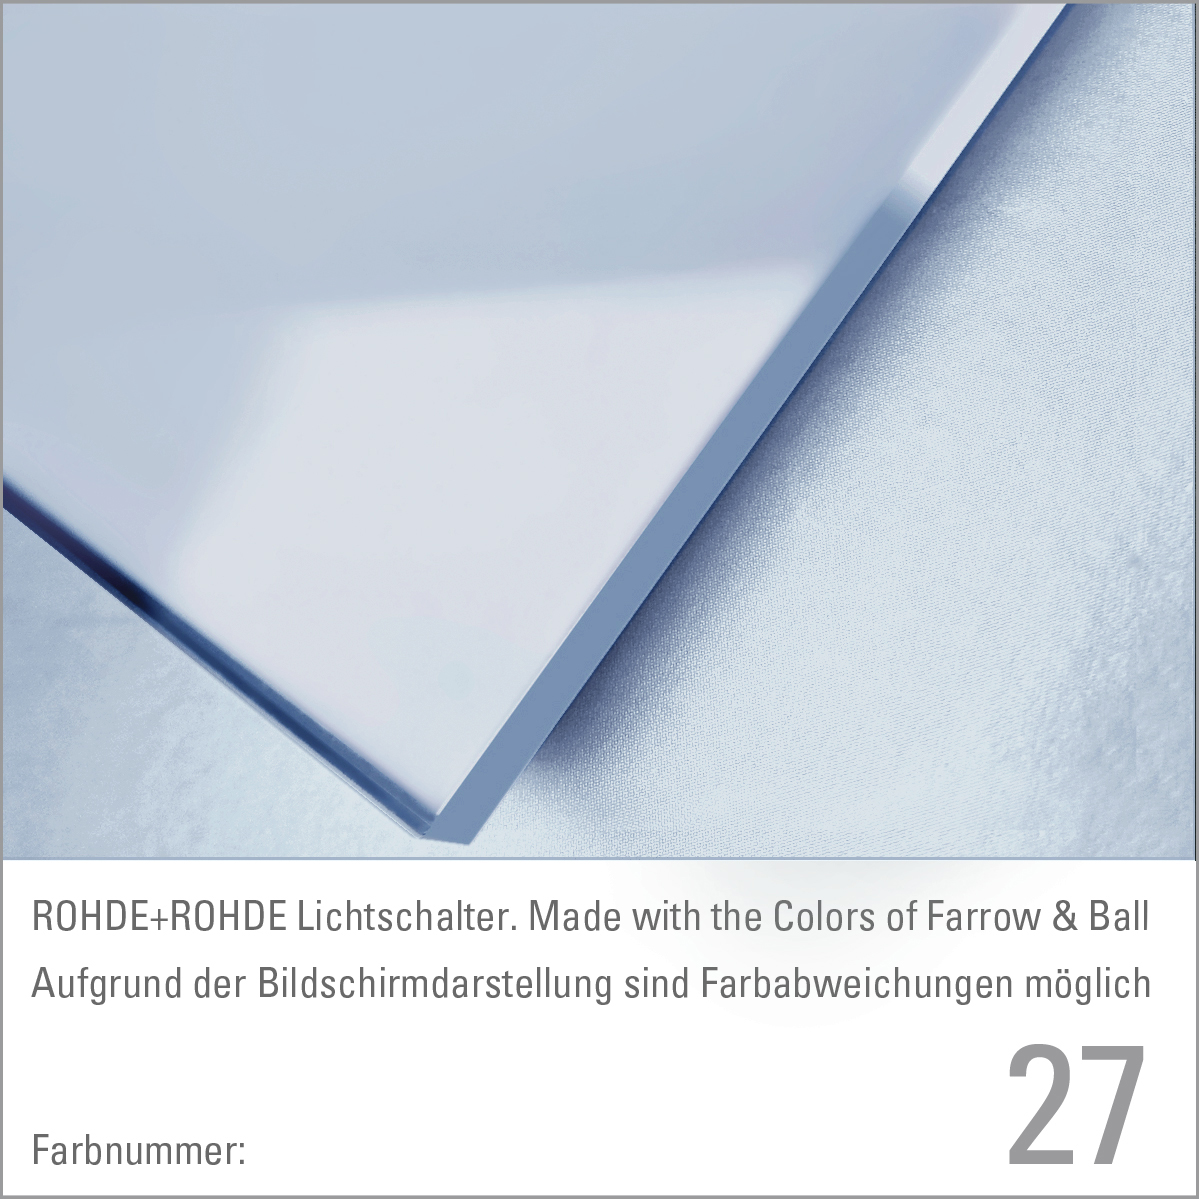 Farbkarte / Farbfächer, Farrow & Ball